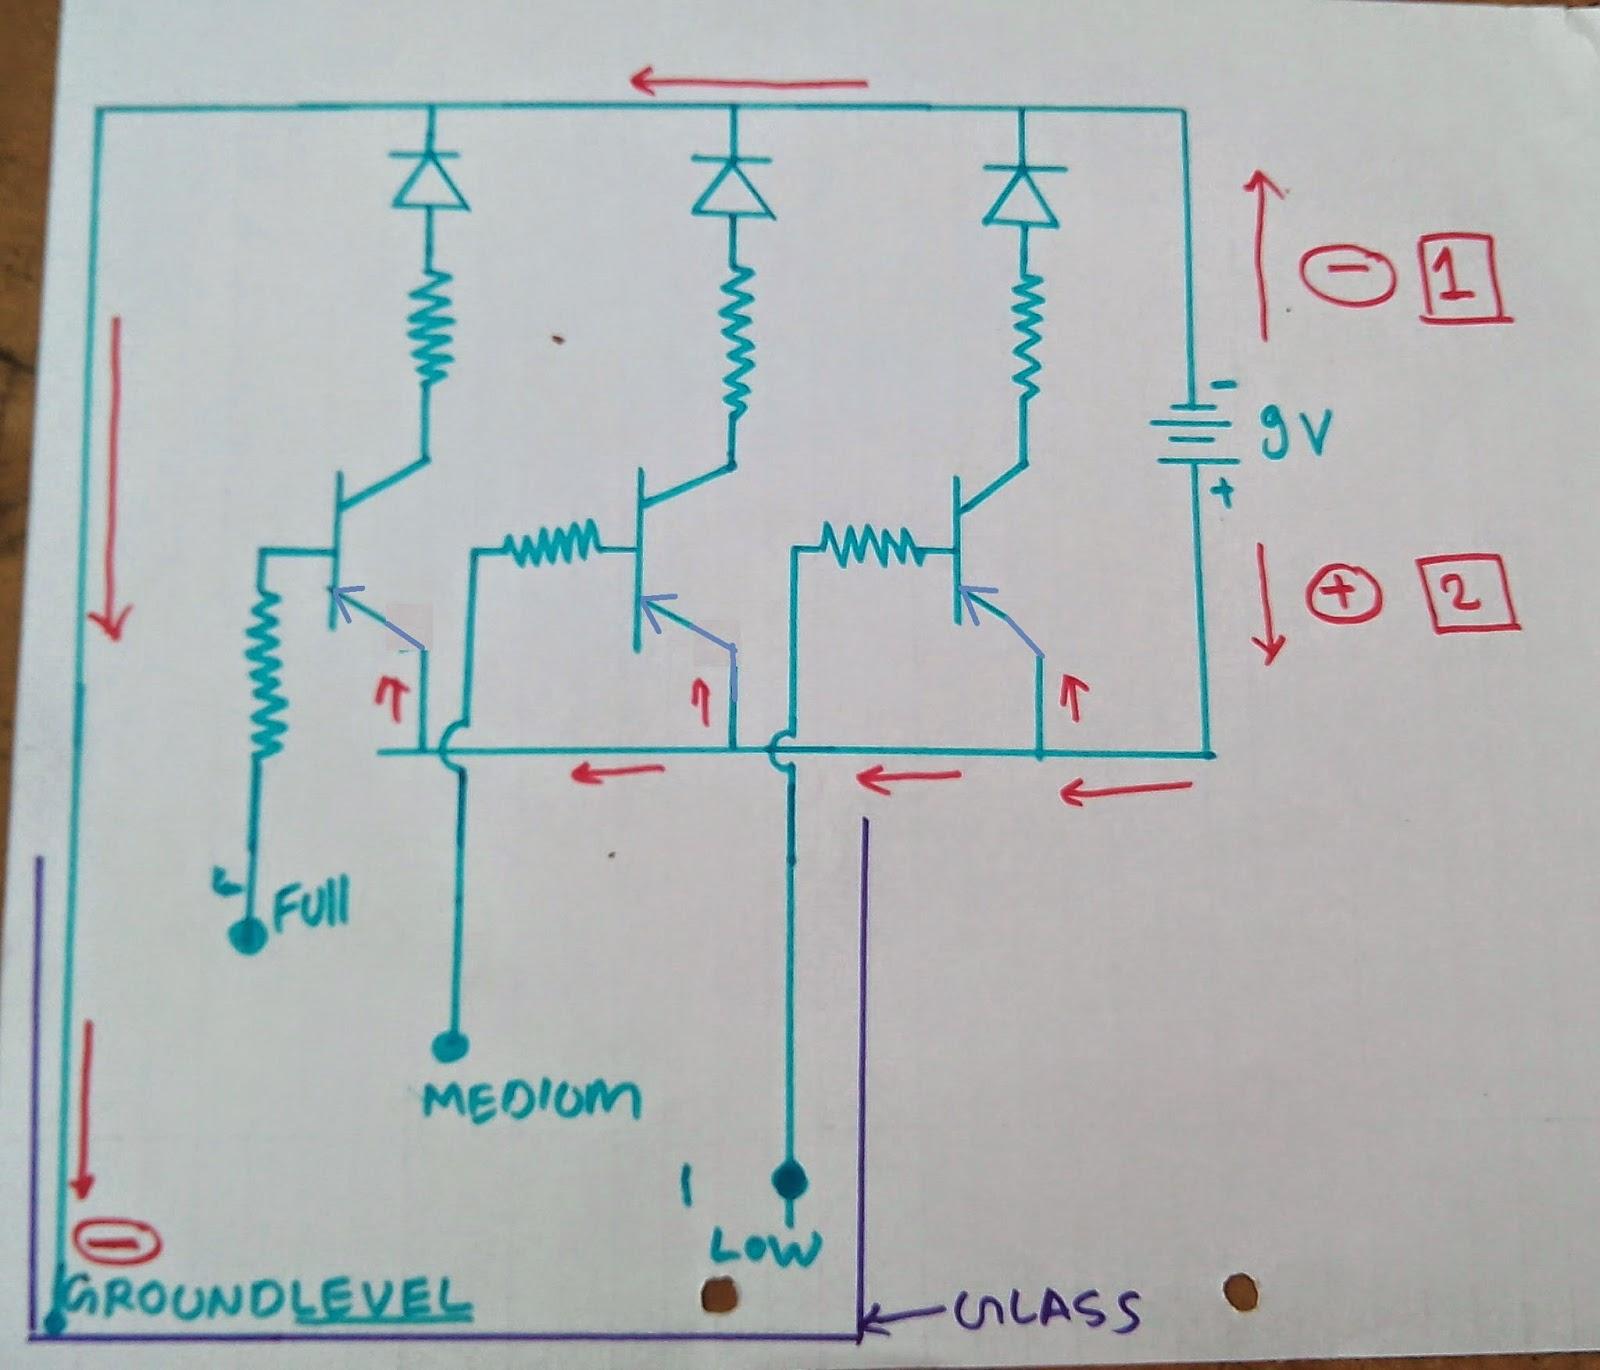 Water Level Indicator Darkactivated Buzzer Circuit Schematic Step 2